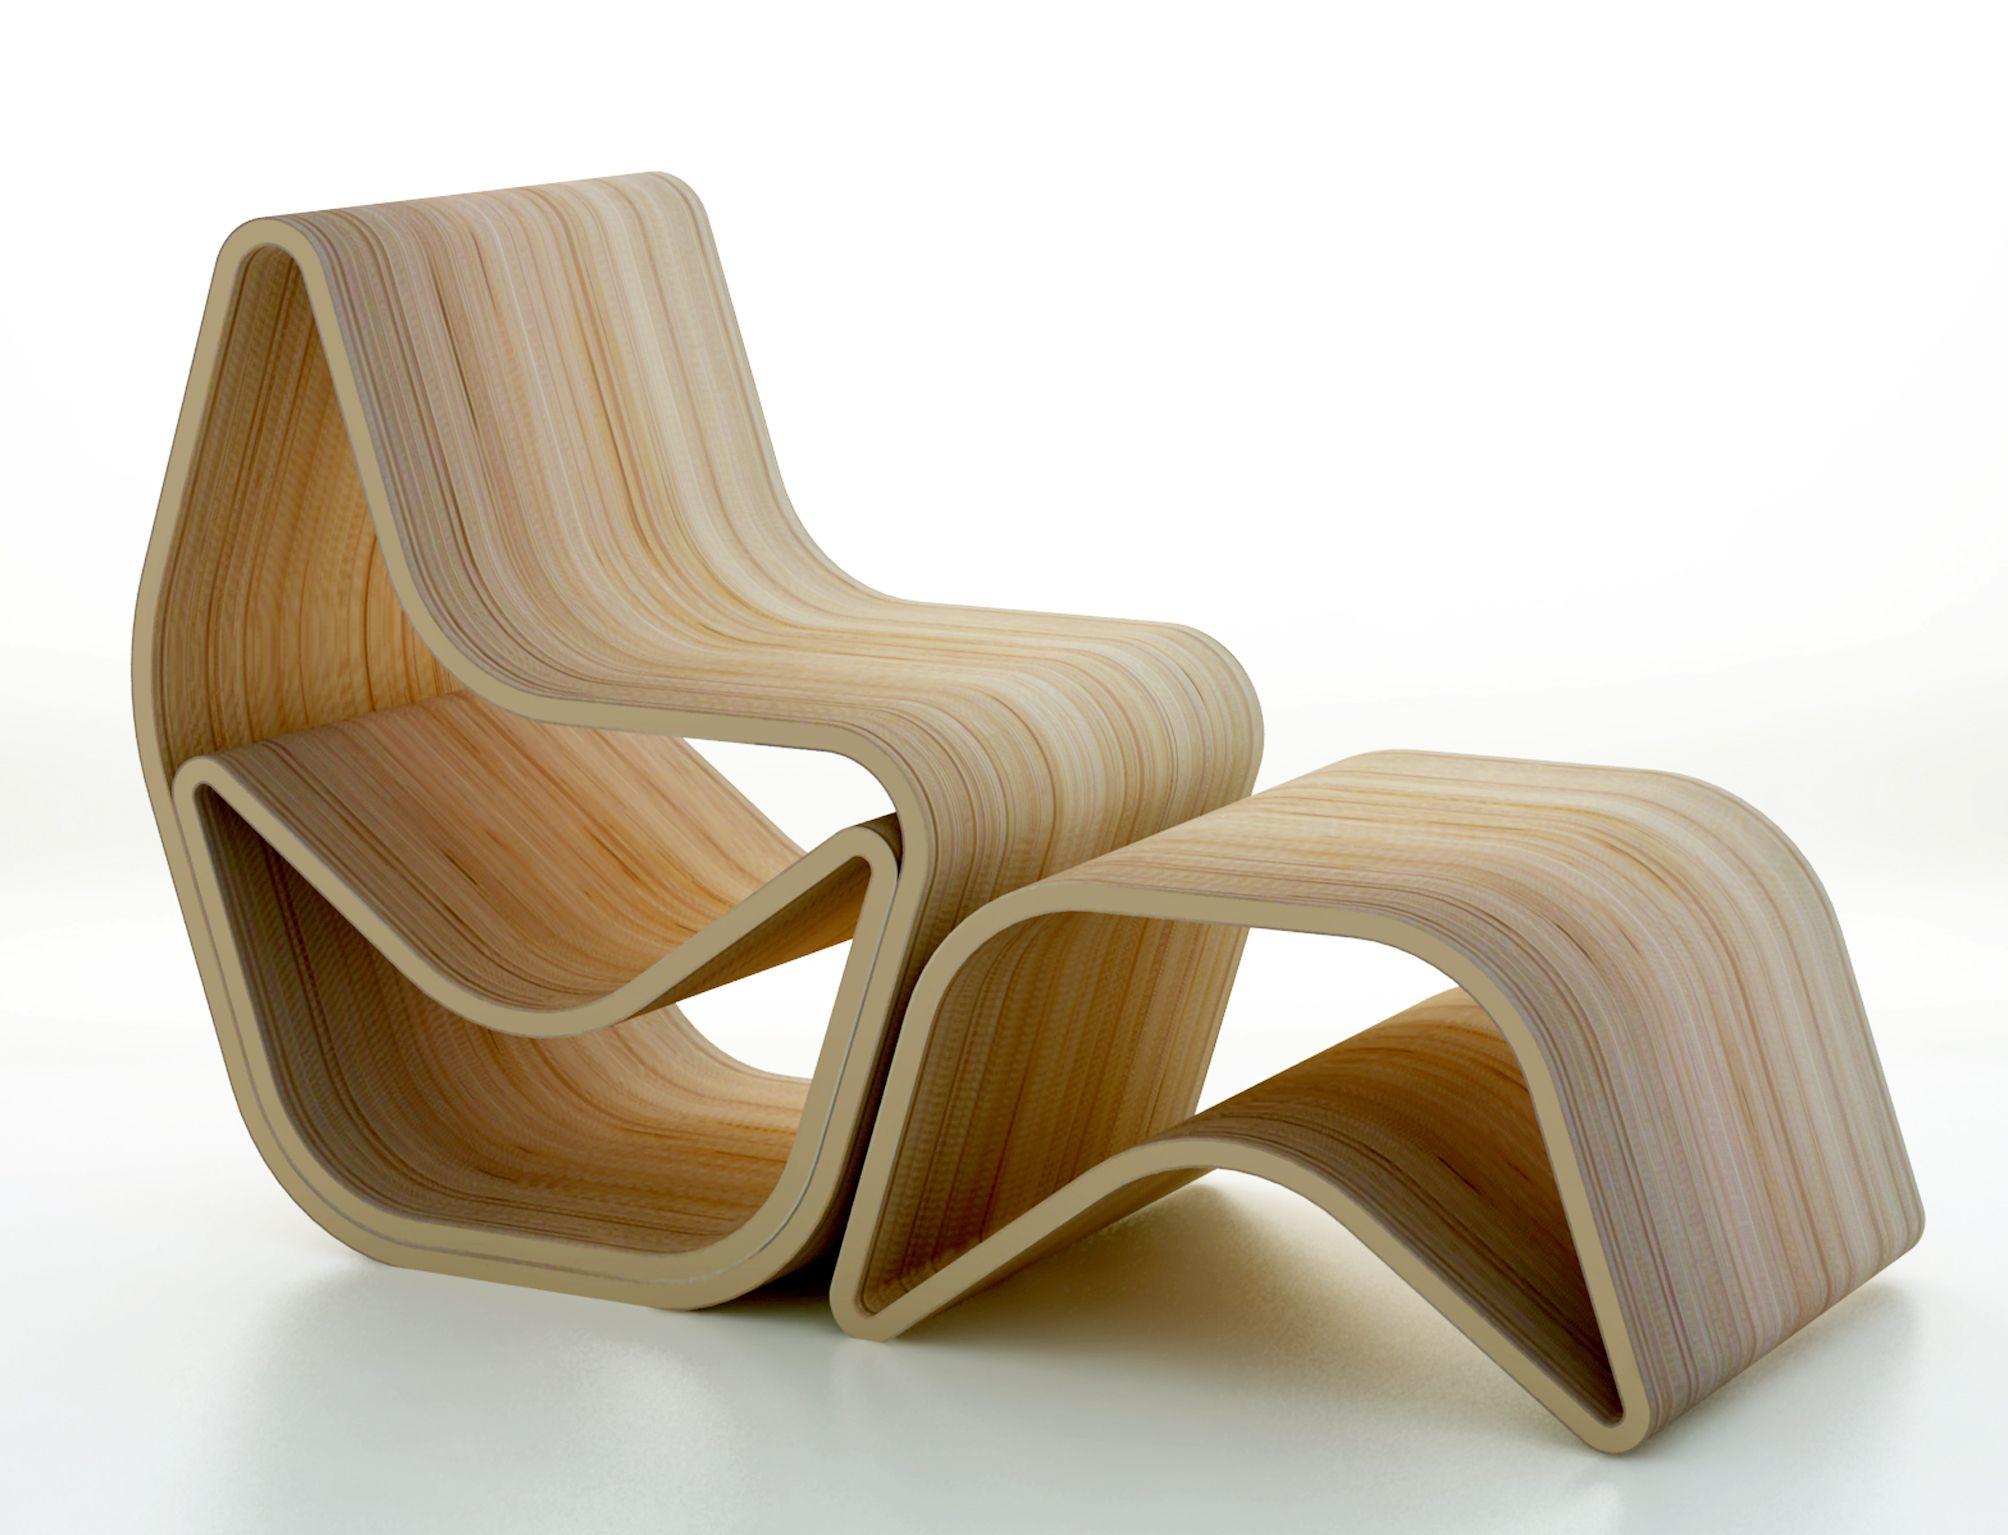 Gval Chair By Gustavo Reboredo Louis Sicard Nenad Katic  # Muebles Gustavo